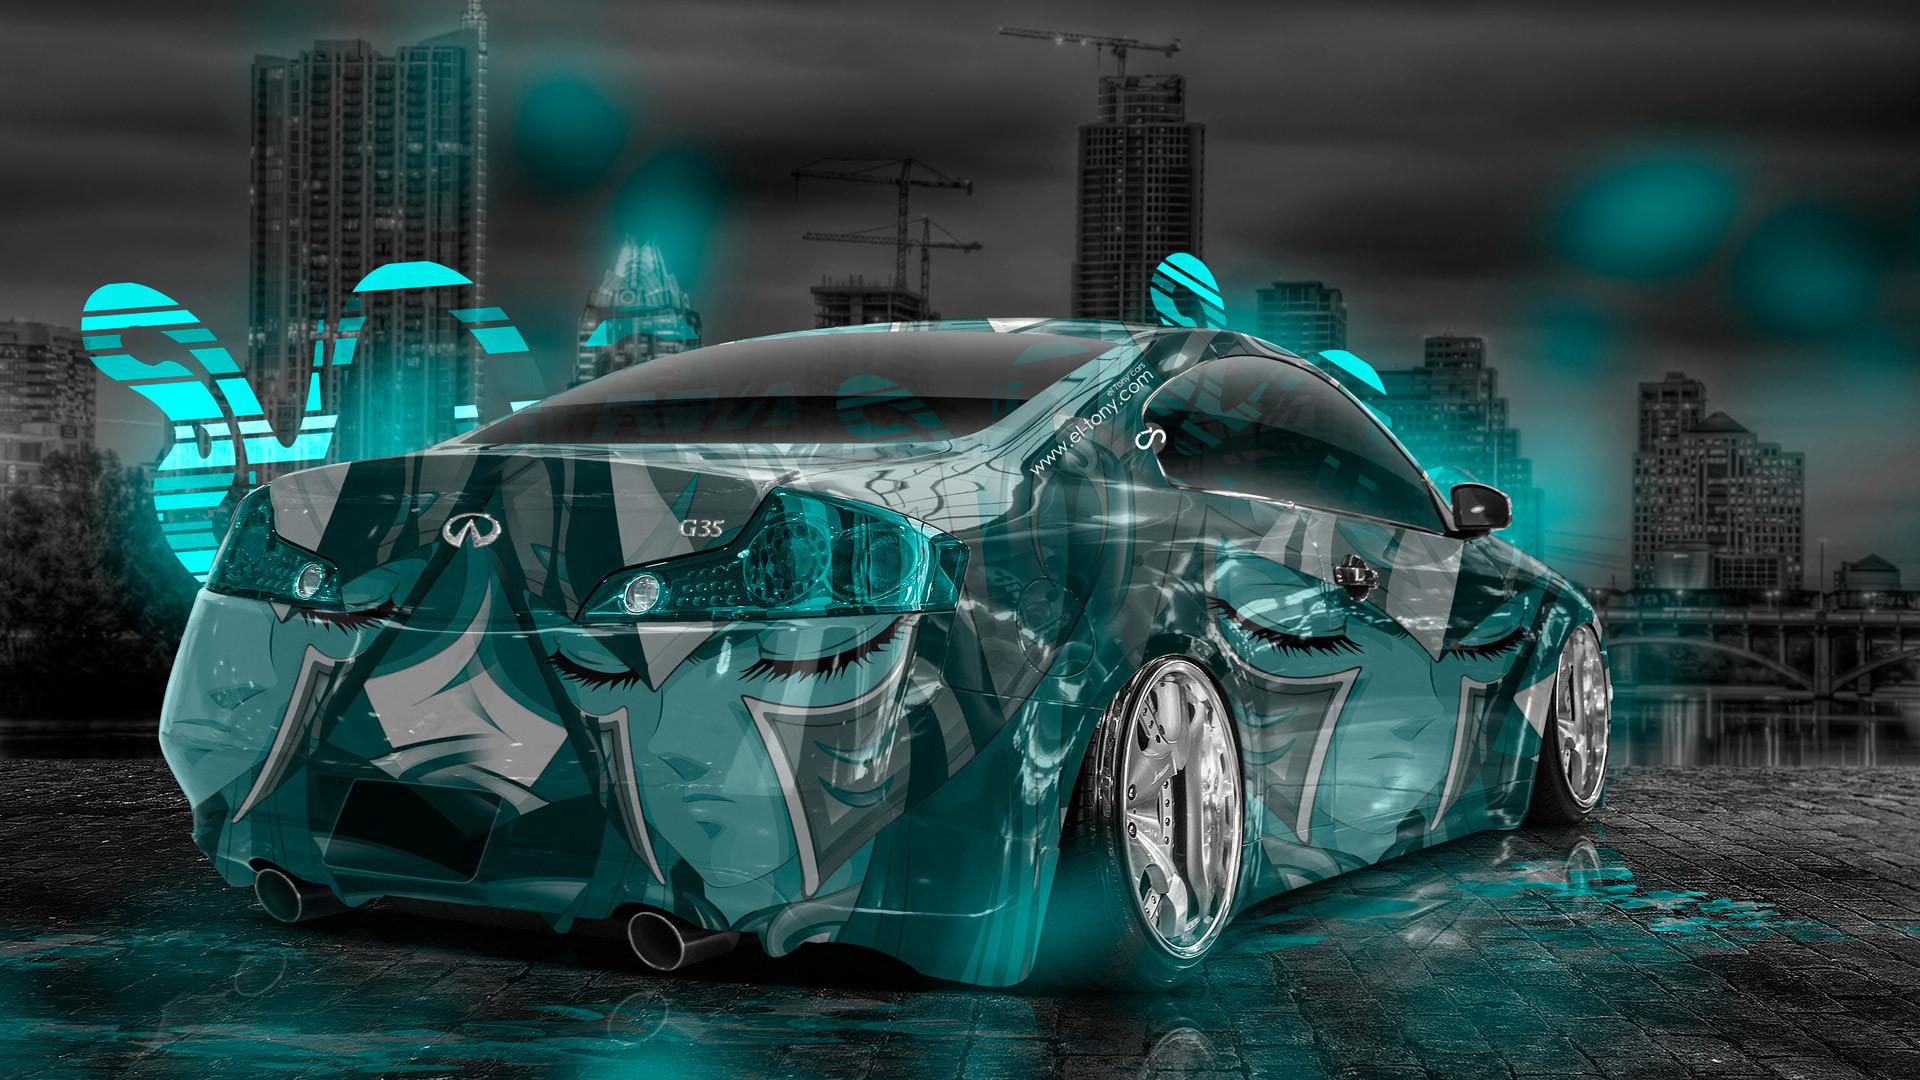 Infiniti-G35-Anime-Aerography-City-Car-2014-Azure-